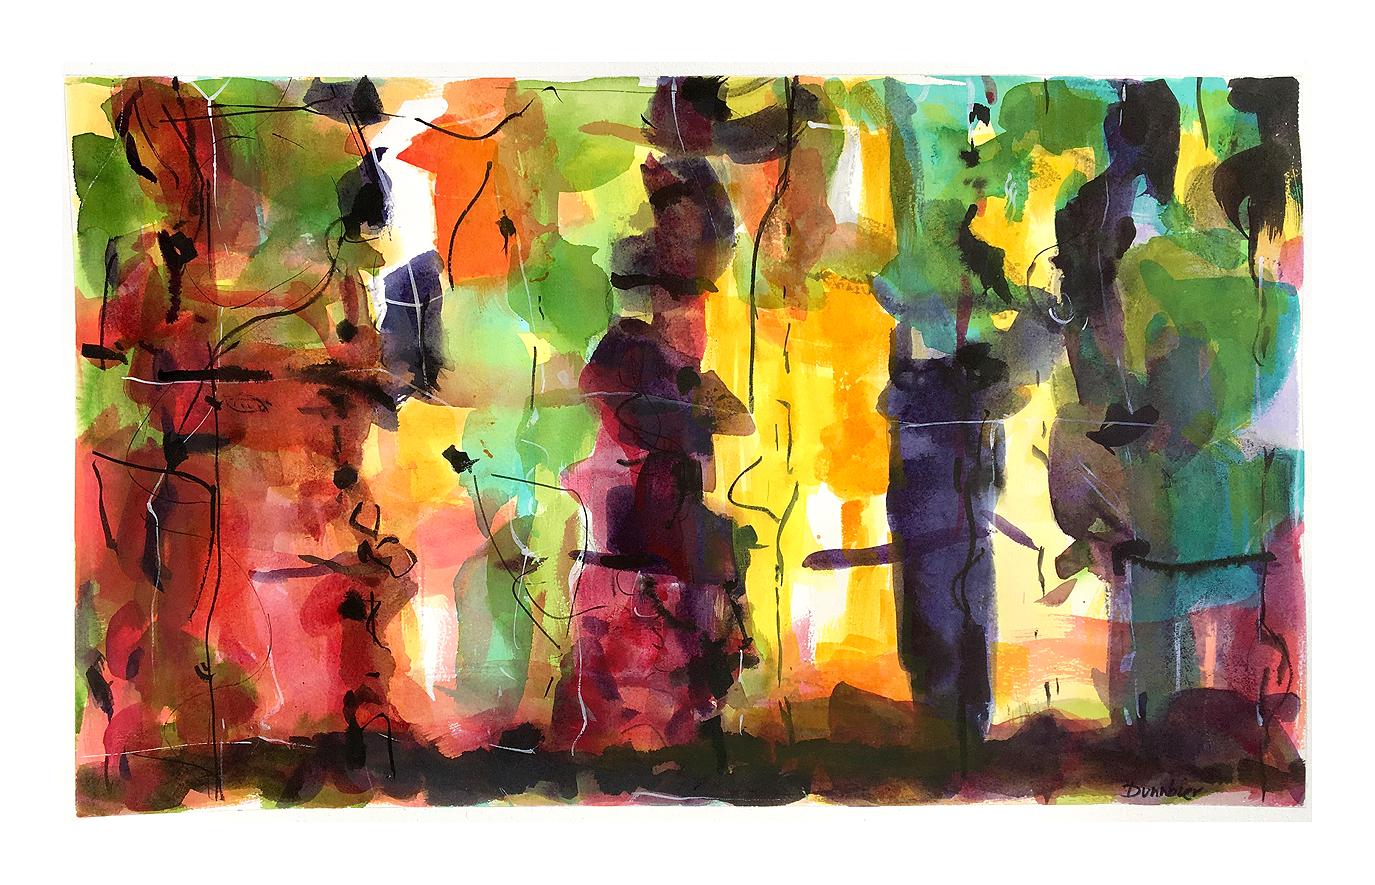 Dunnbier_Tidal Pool 2_watercolor_25x10